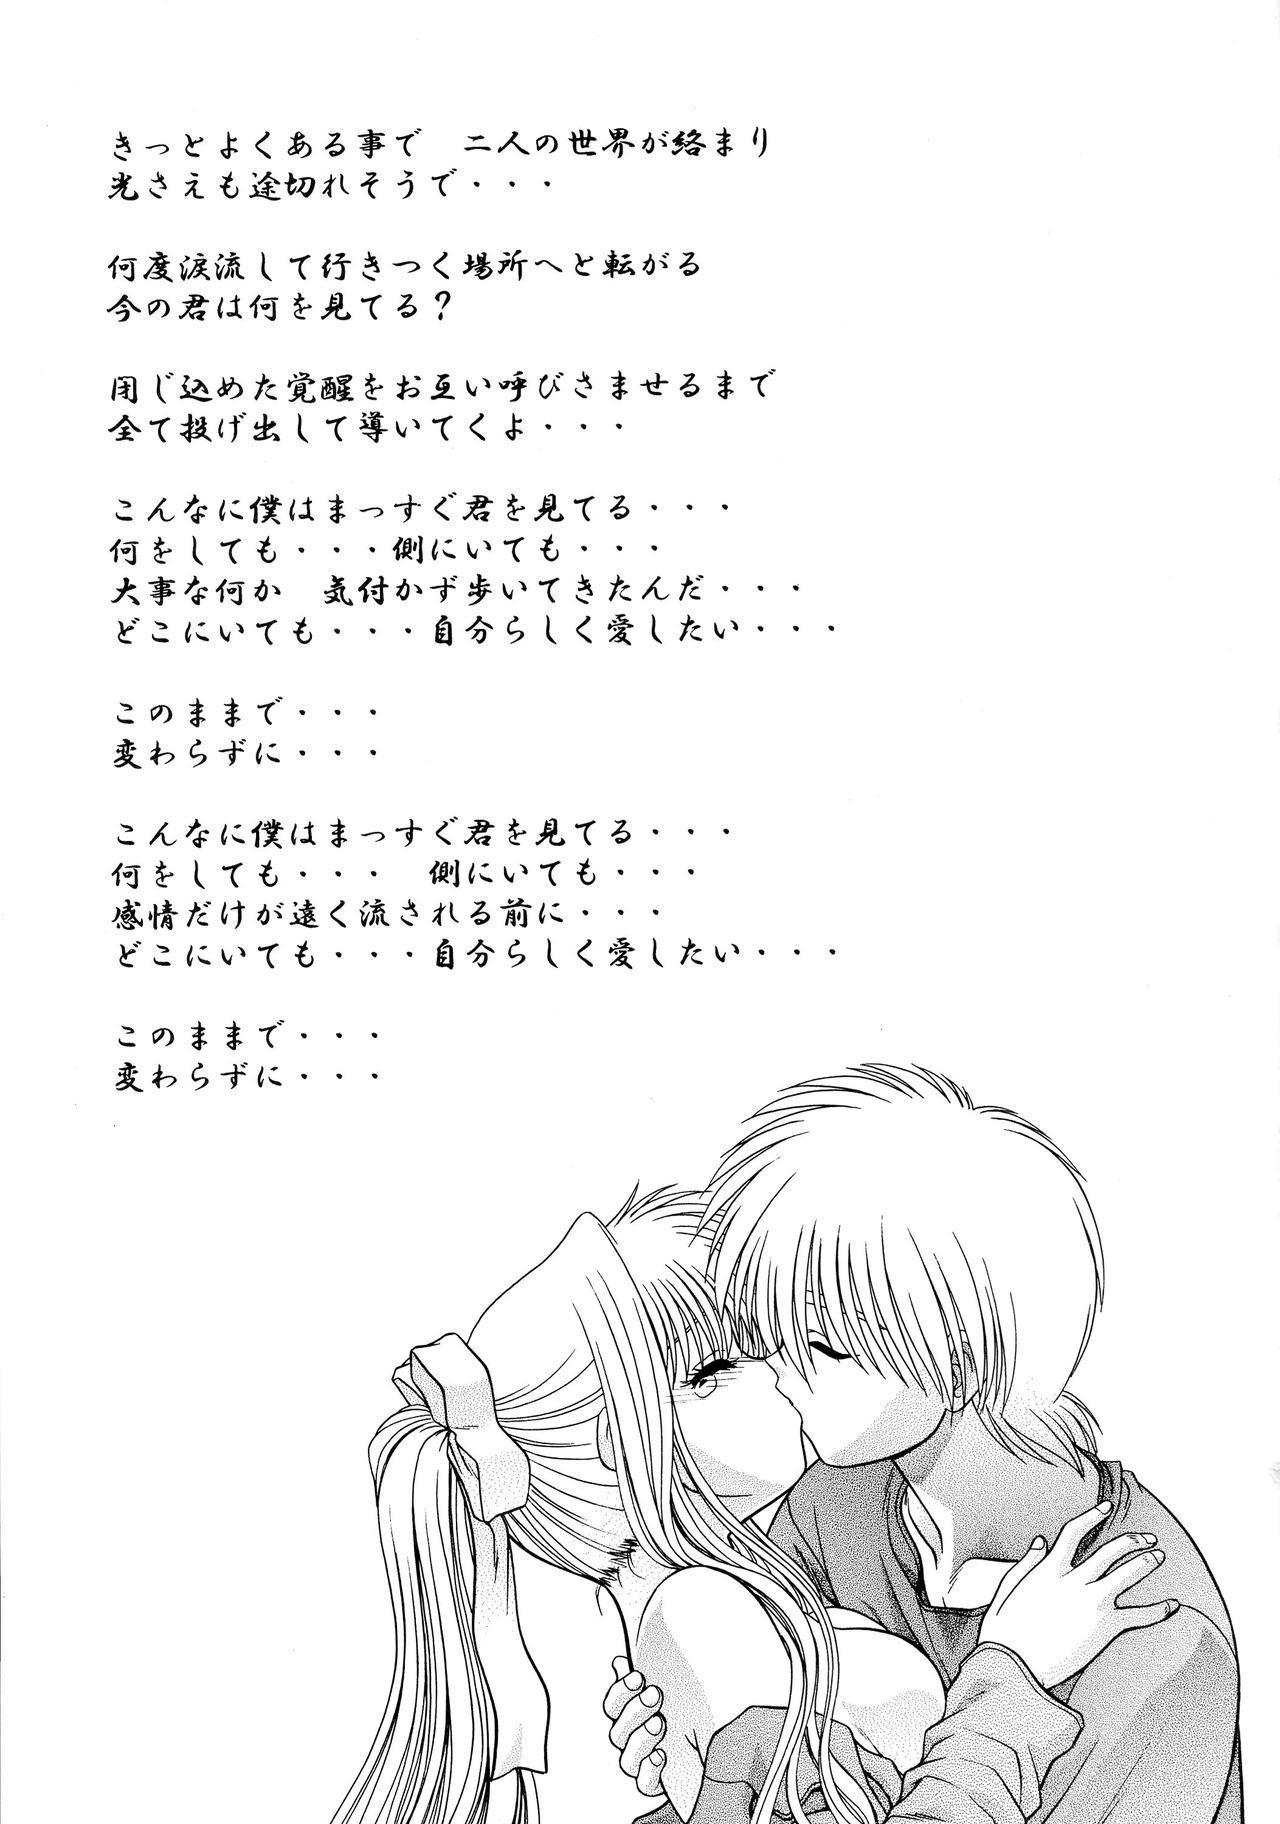 BLUE BLOOD'S Vol.9 37